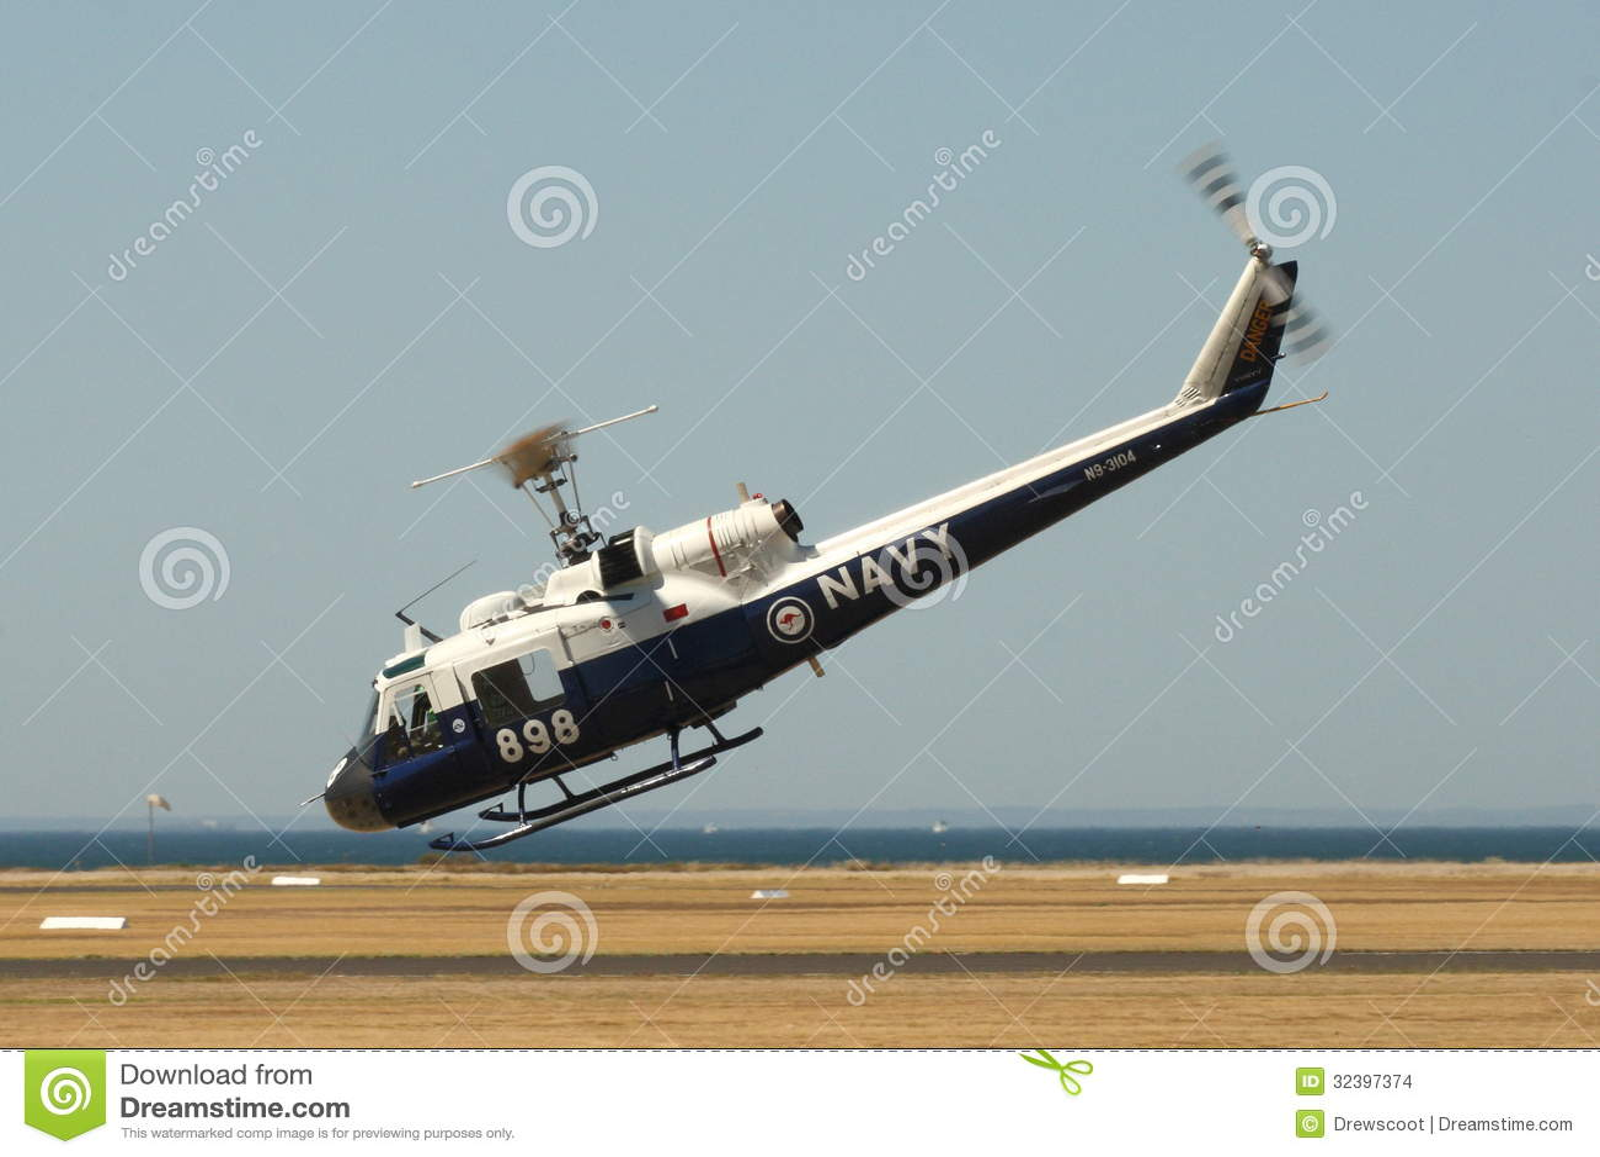 Iroquois UH--1Bhelikopter som gör behandla skärm